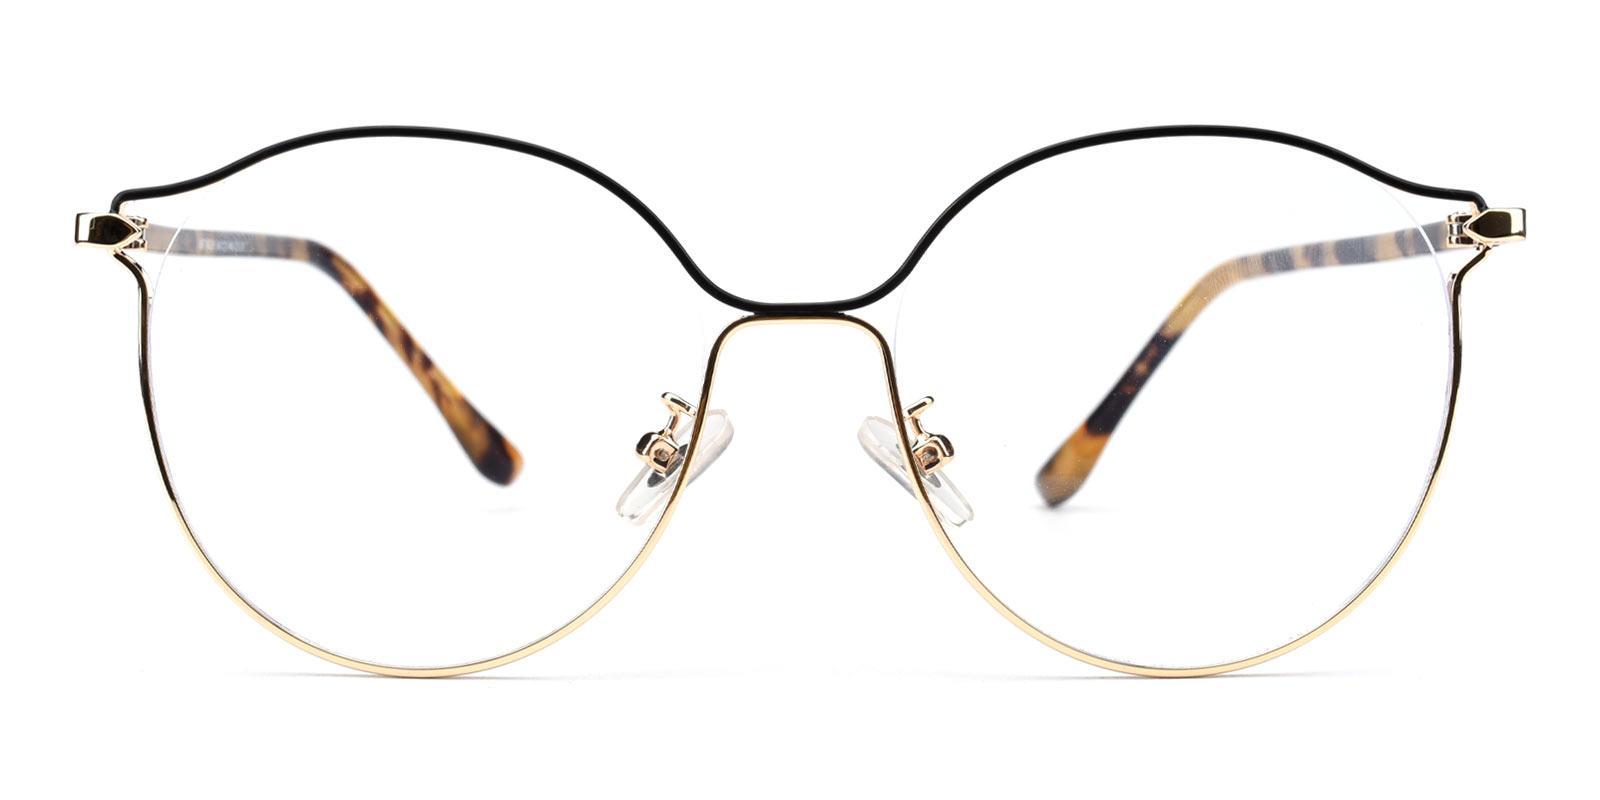 Alpha-Leopard-Round-Metal-Eyeglasses-detail